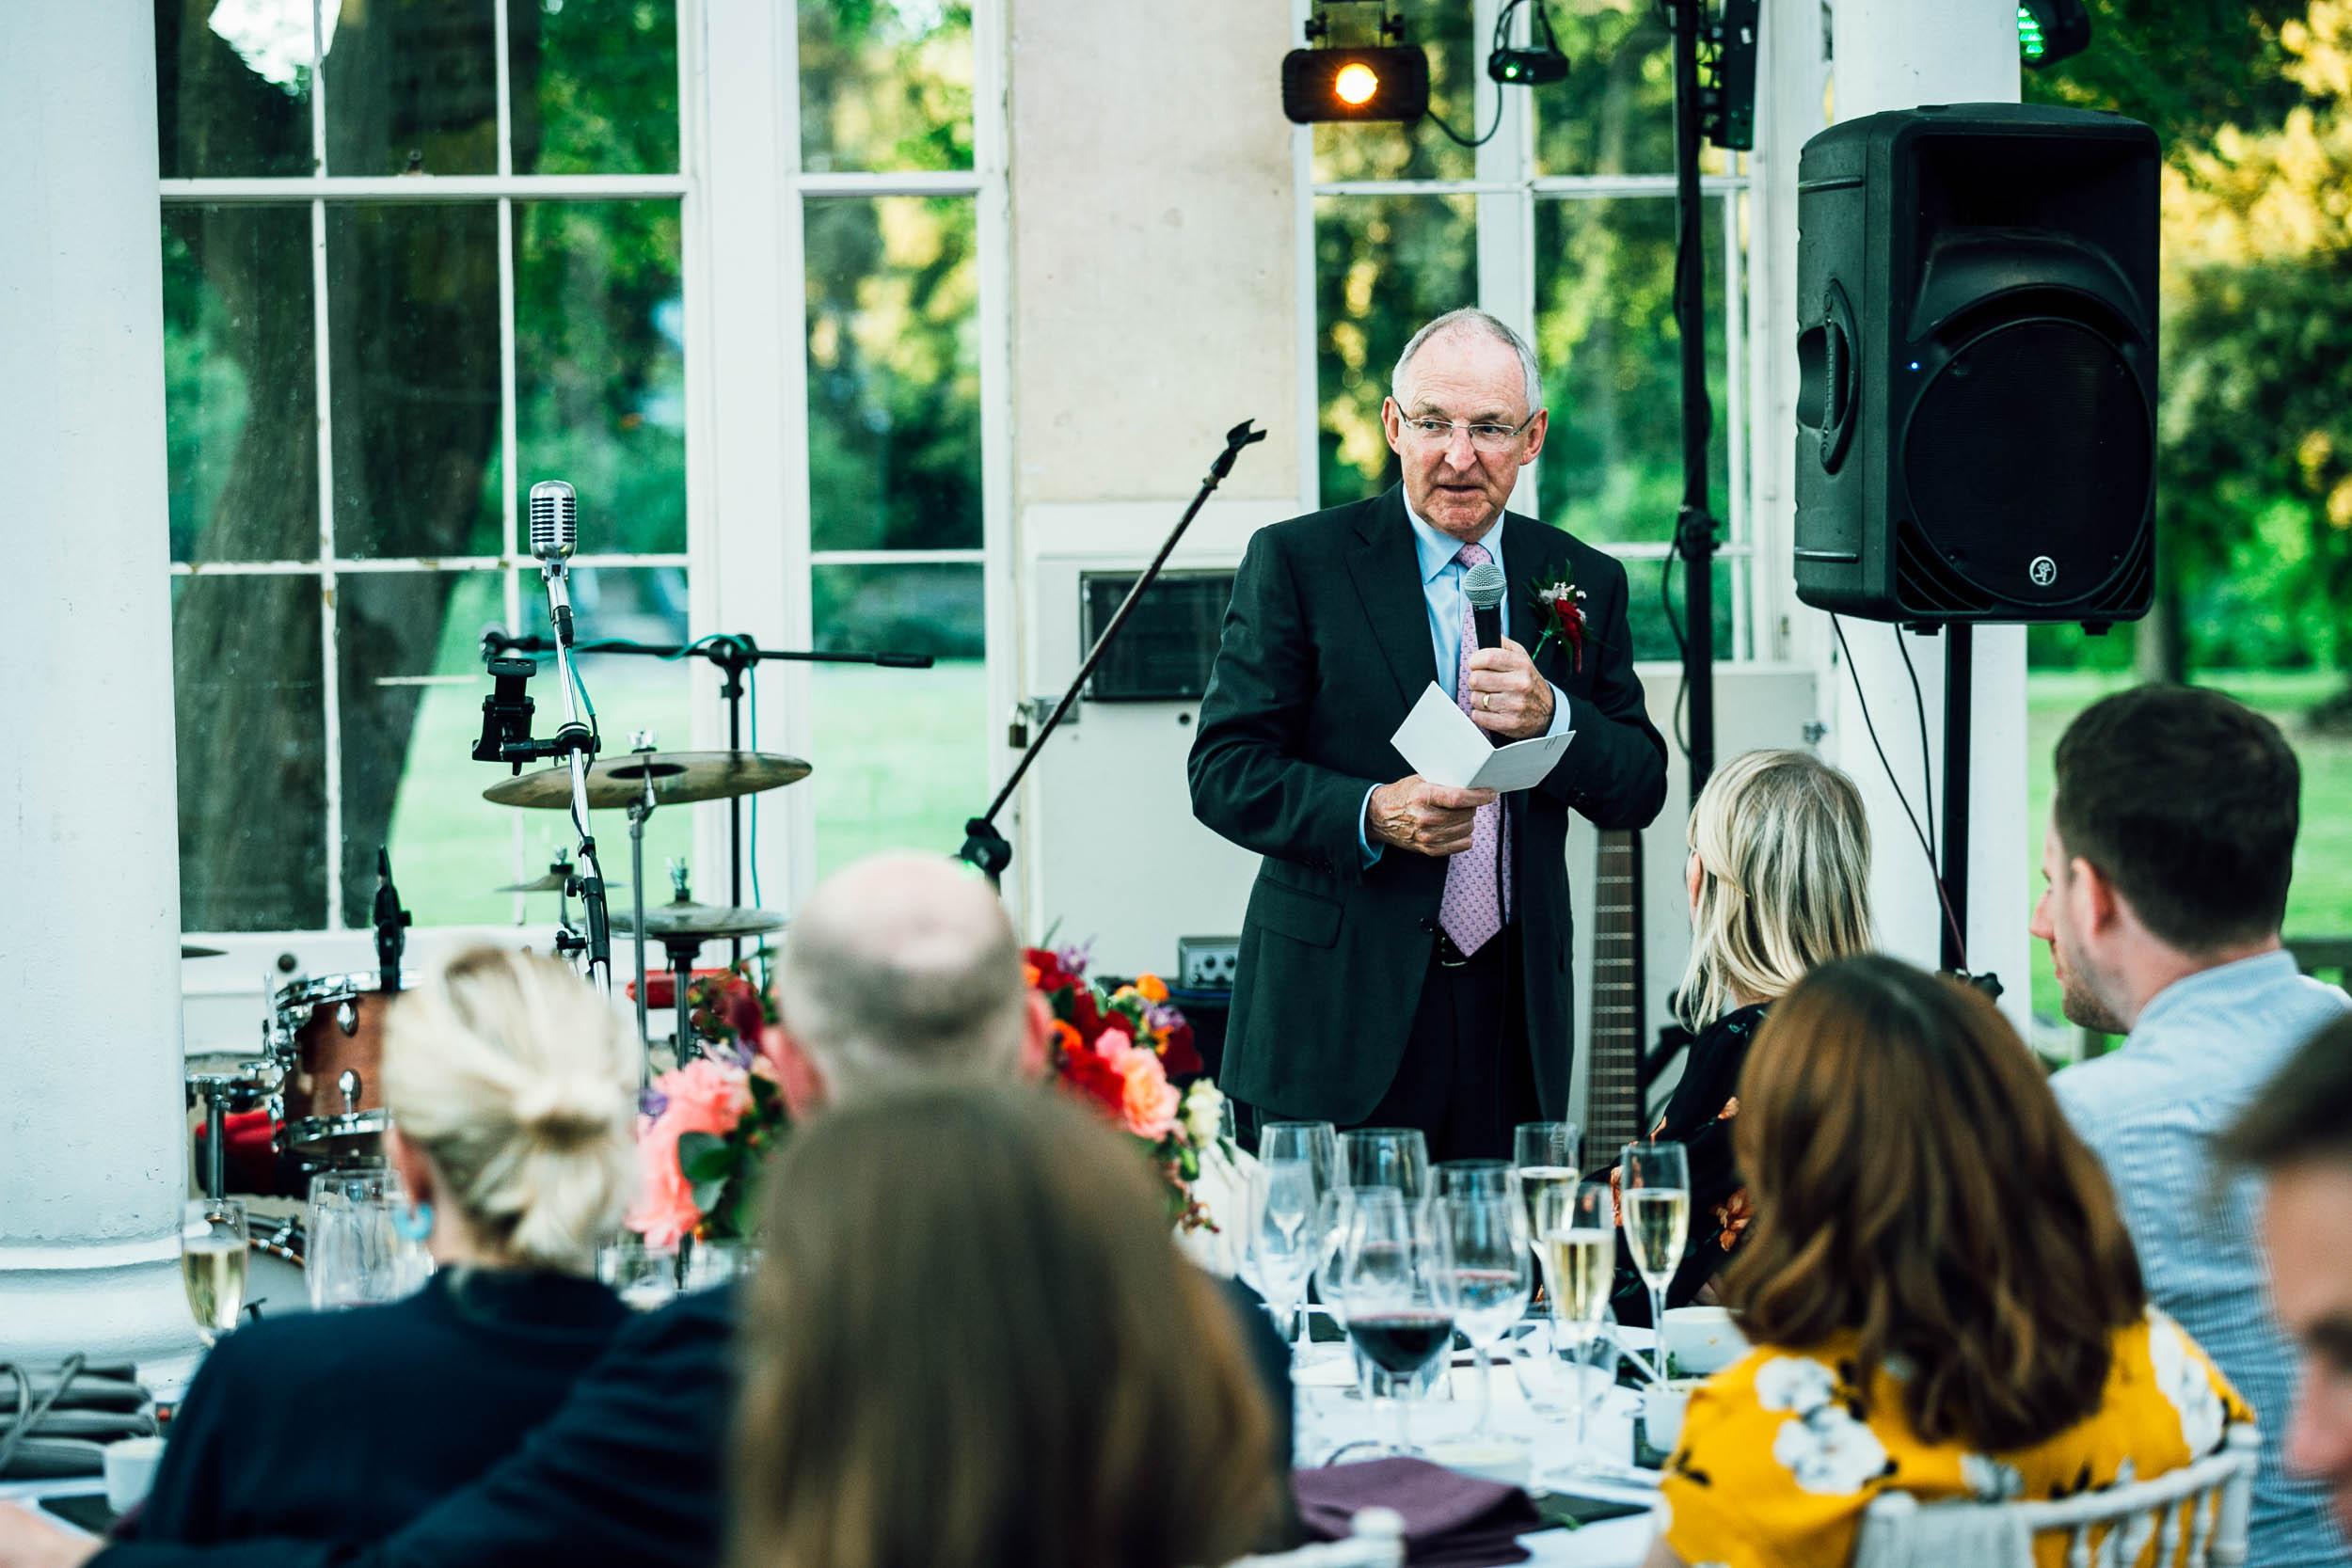 syon-house-wedding-photographer-london 144.jpg